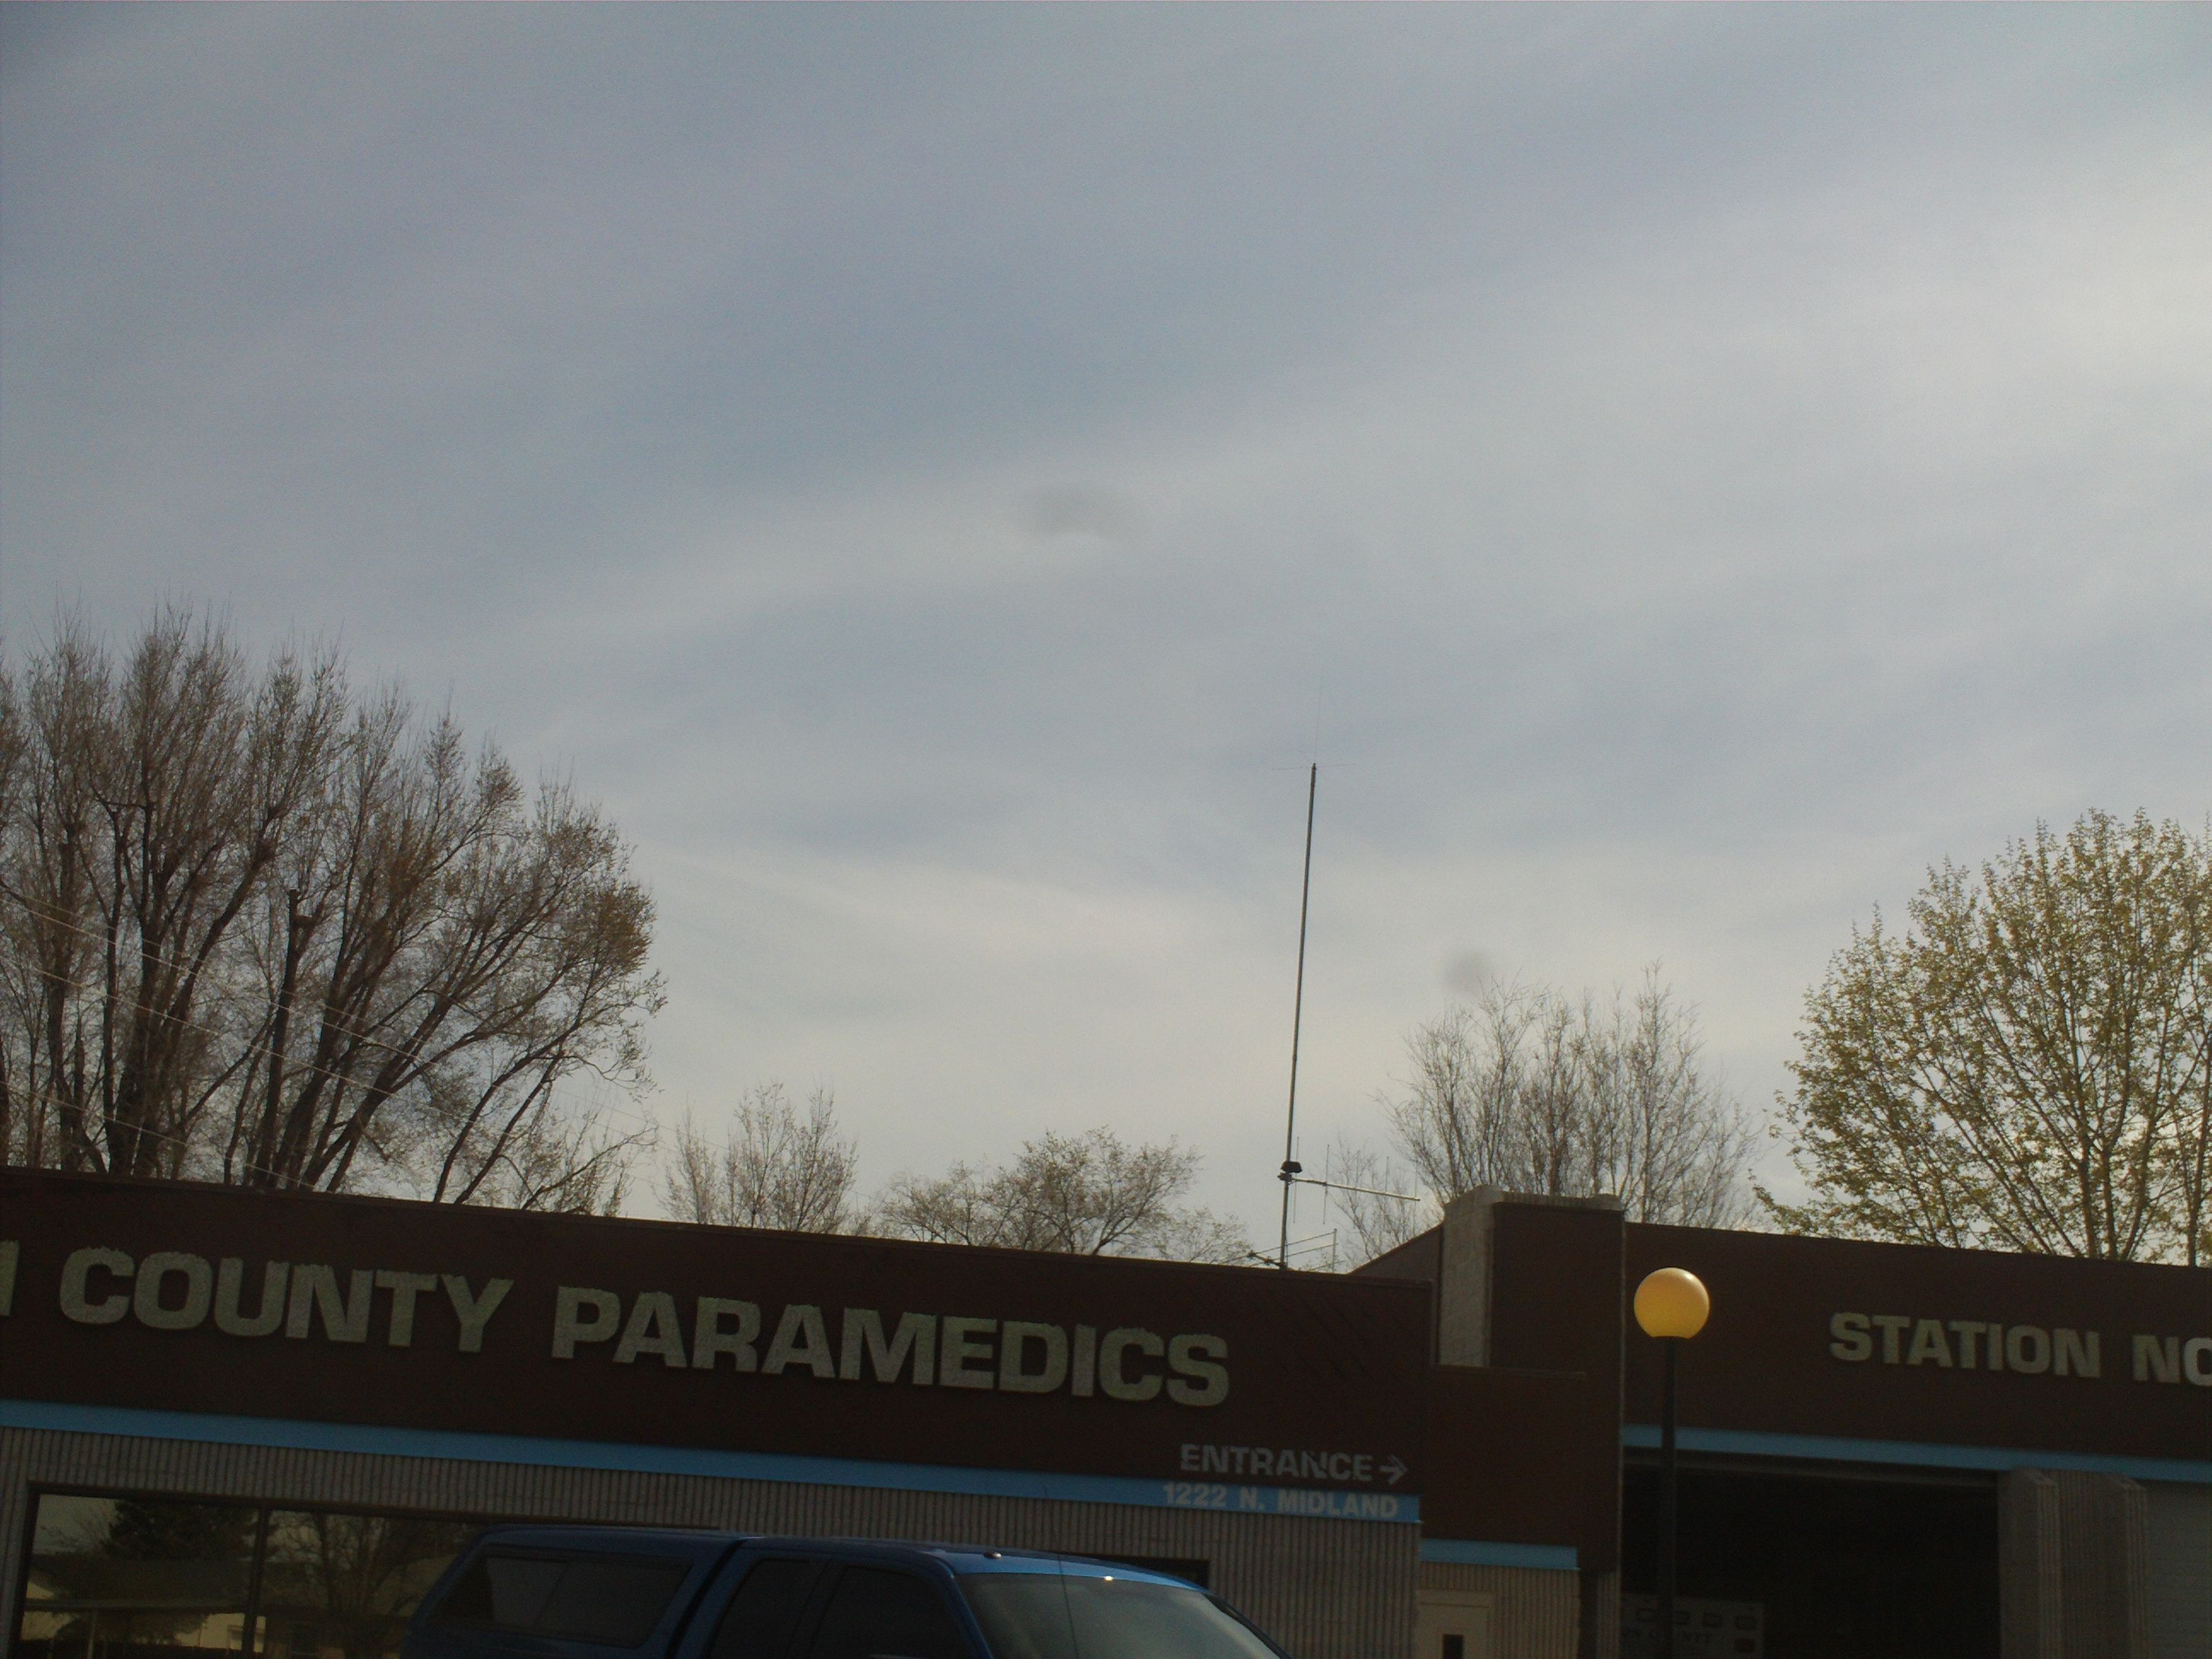 Pt 249 april 2014 antenna on paramedic building looks